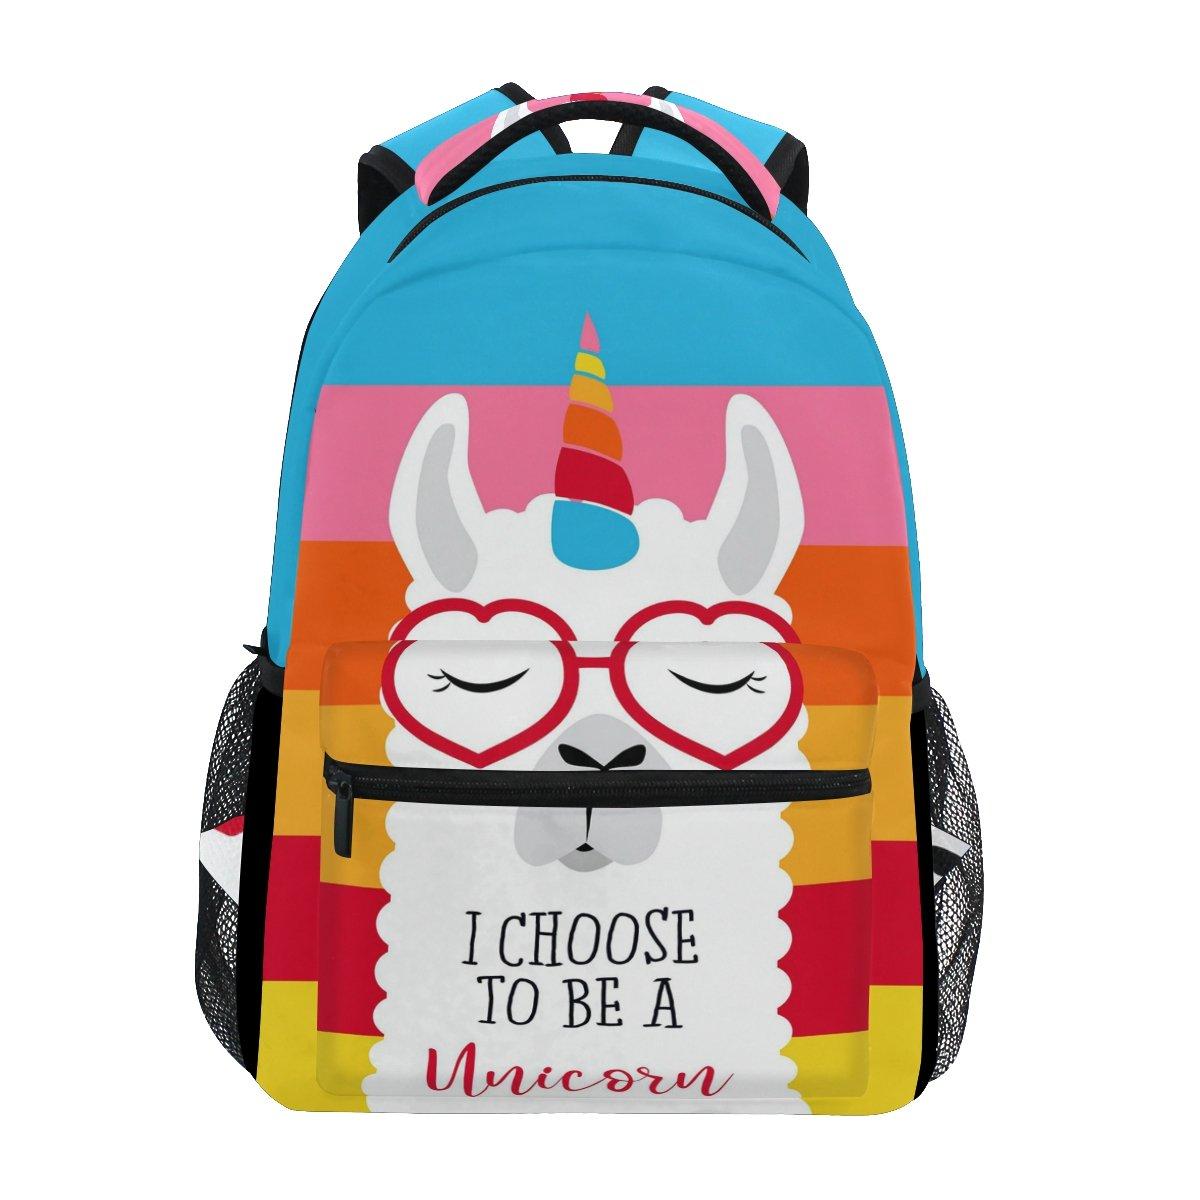 0f60a3ab170 Amazon.com  WXLIFE Rainbow Glitter Galaxy Unicorn Backpack Travel School  Shoulder Bag for Kids Boys Girls Women Men  Computers   Accessories